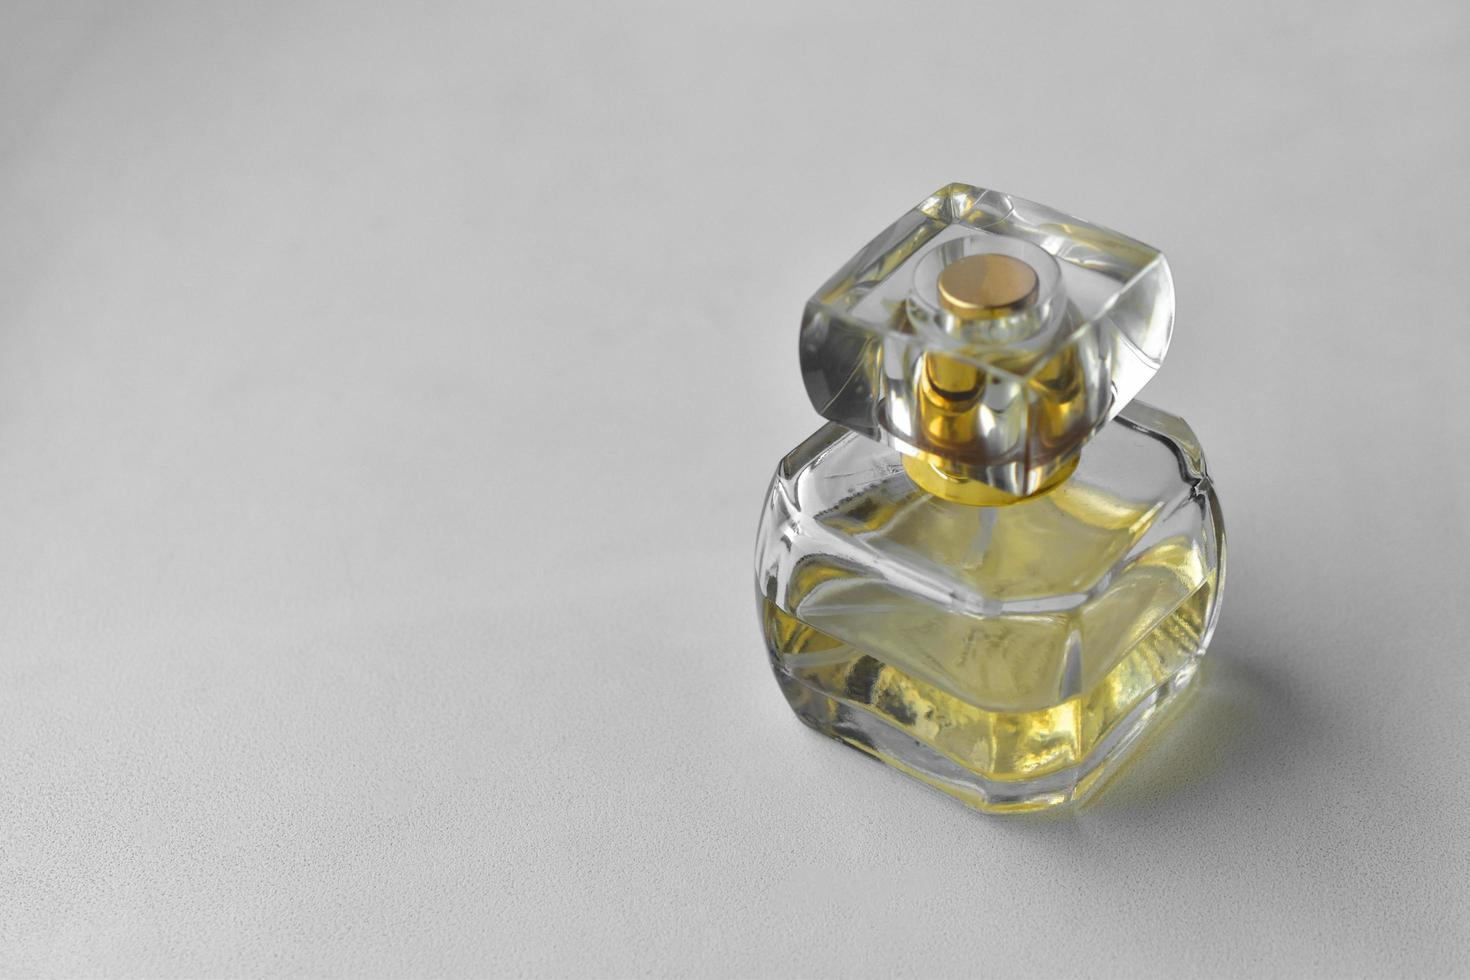 Frasco de perfume amarillo sobre un fondo blanco. foto